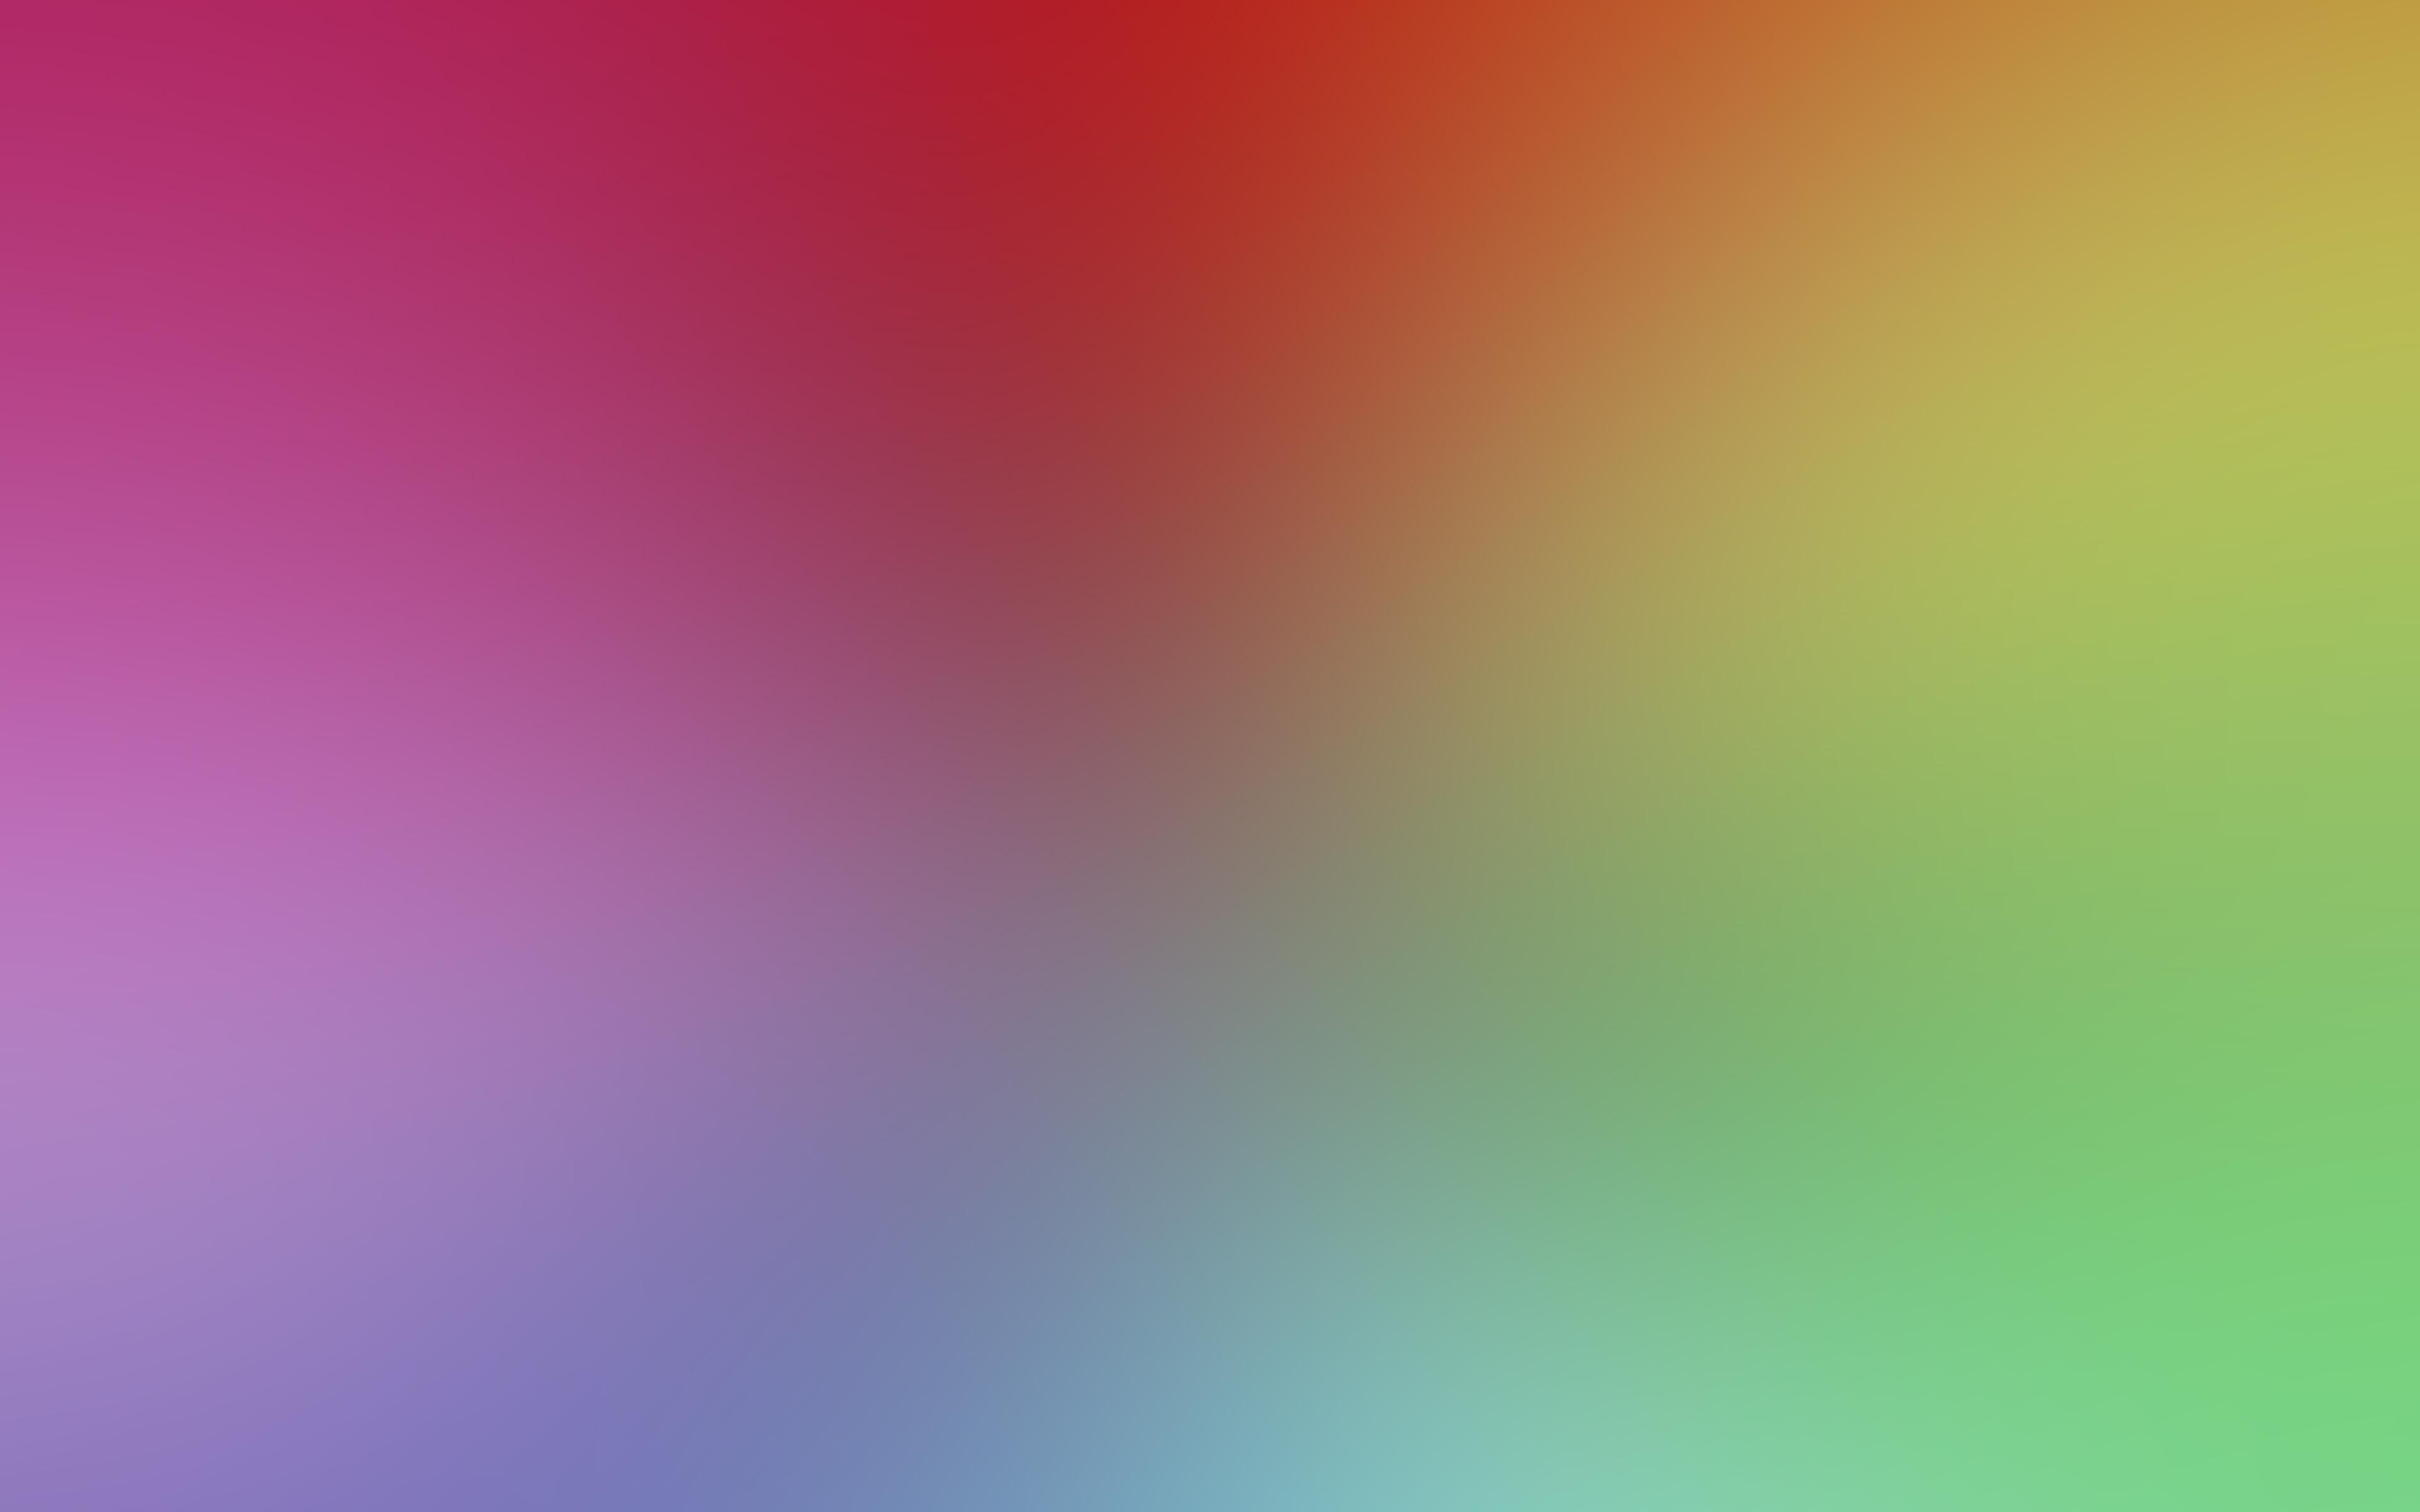 color gradation coloring pages - photo#9